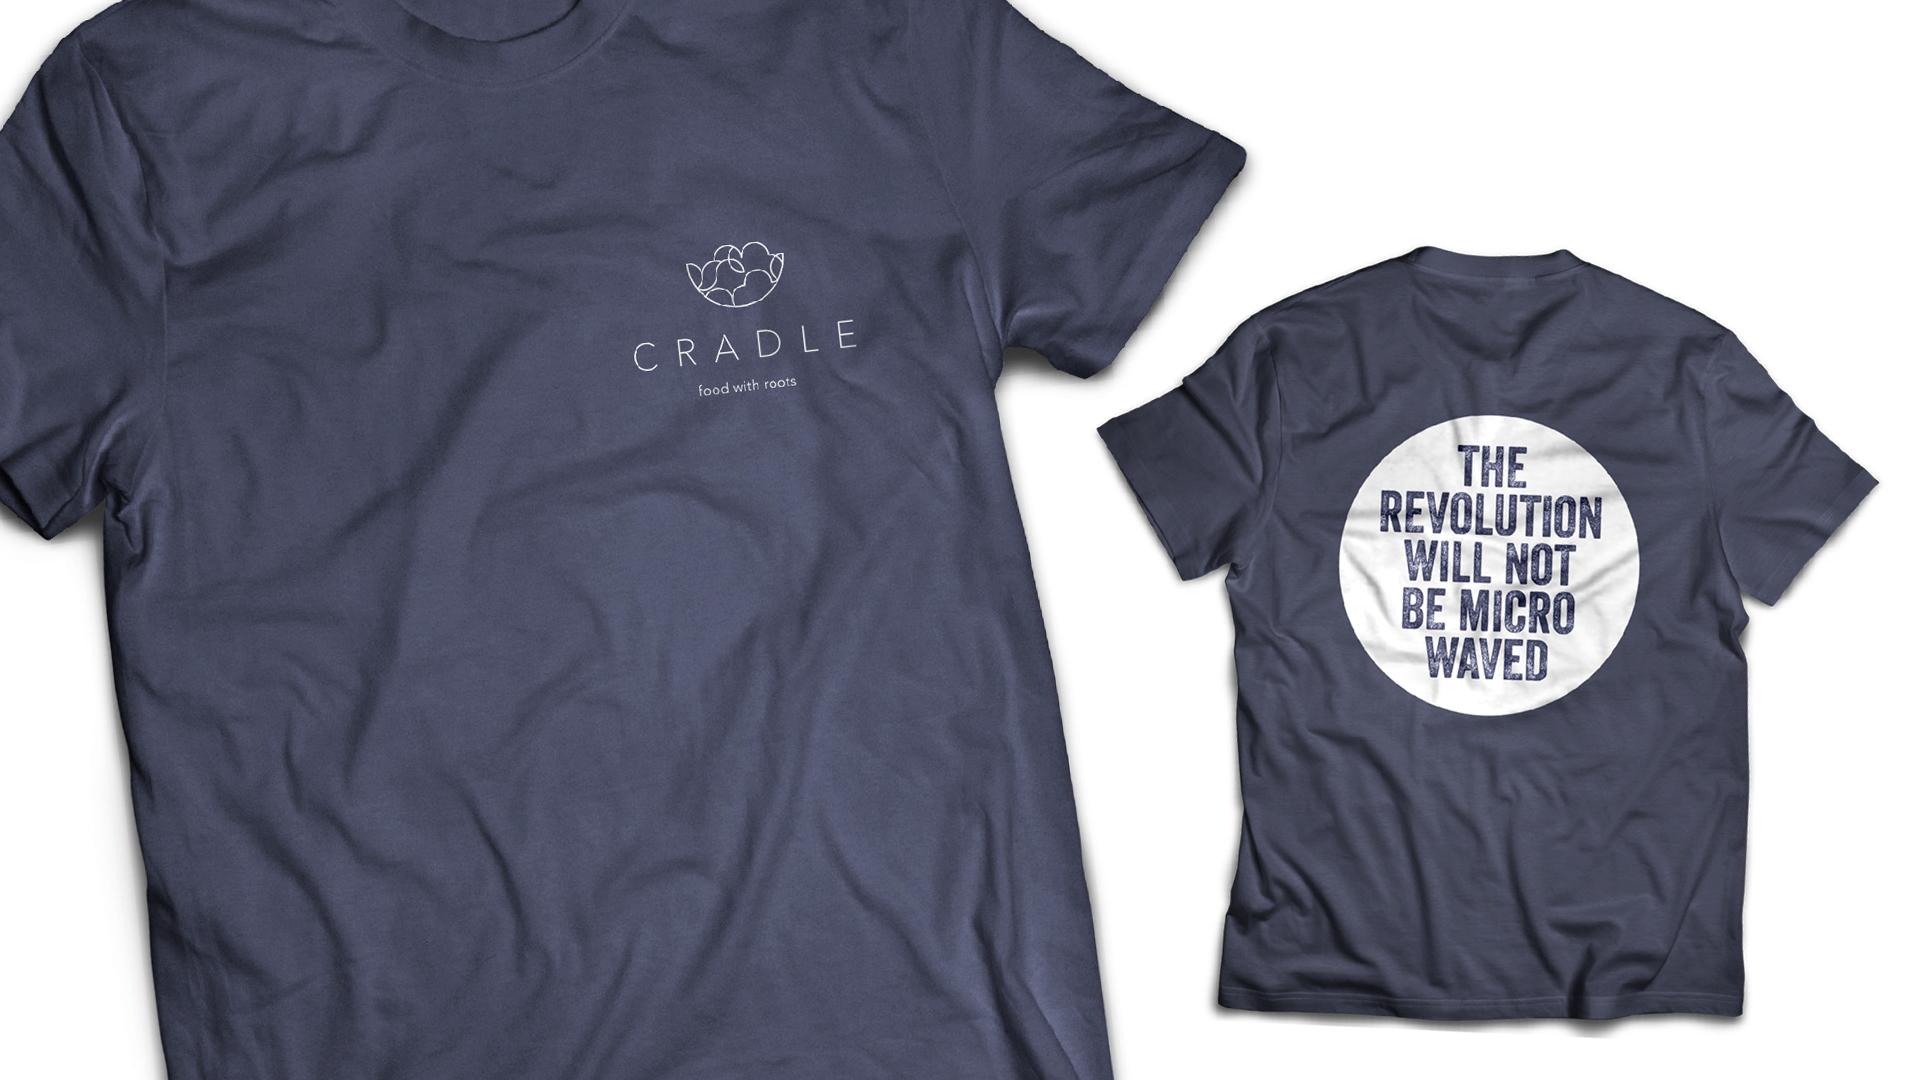 Cradle Branded Garments